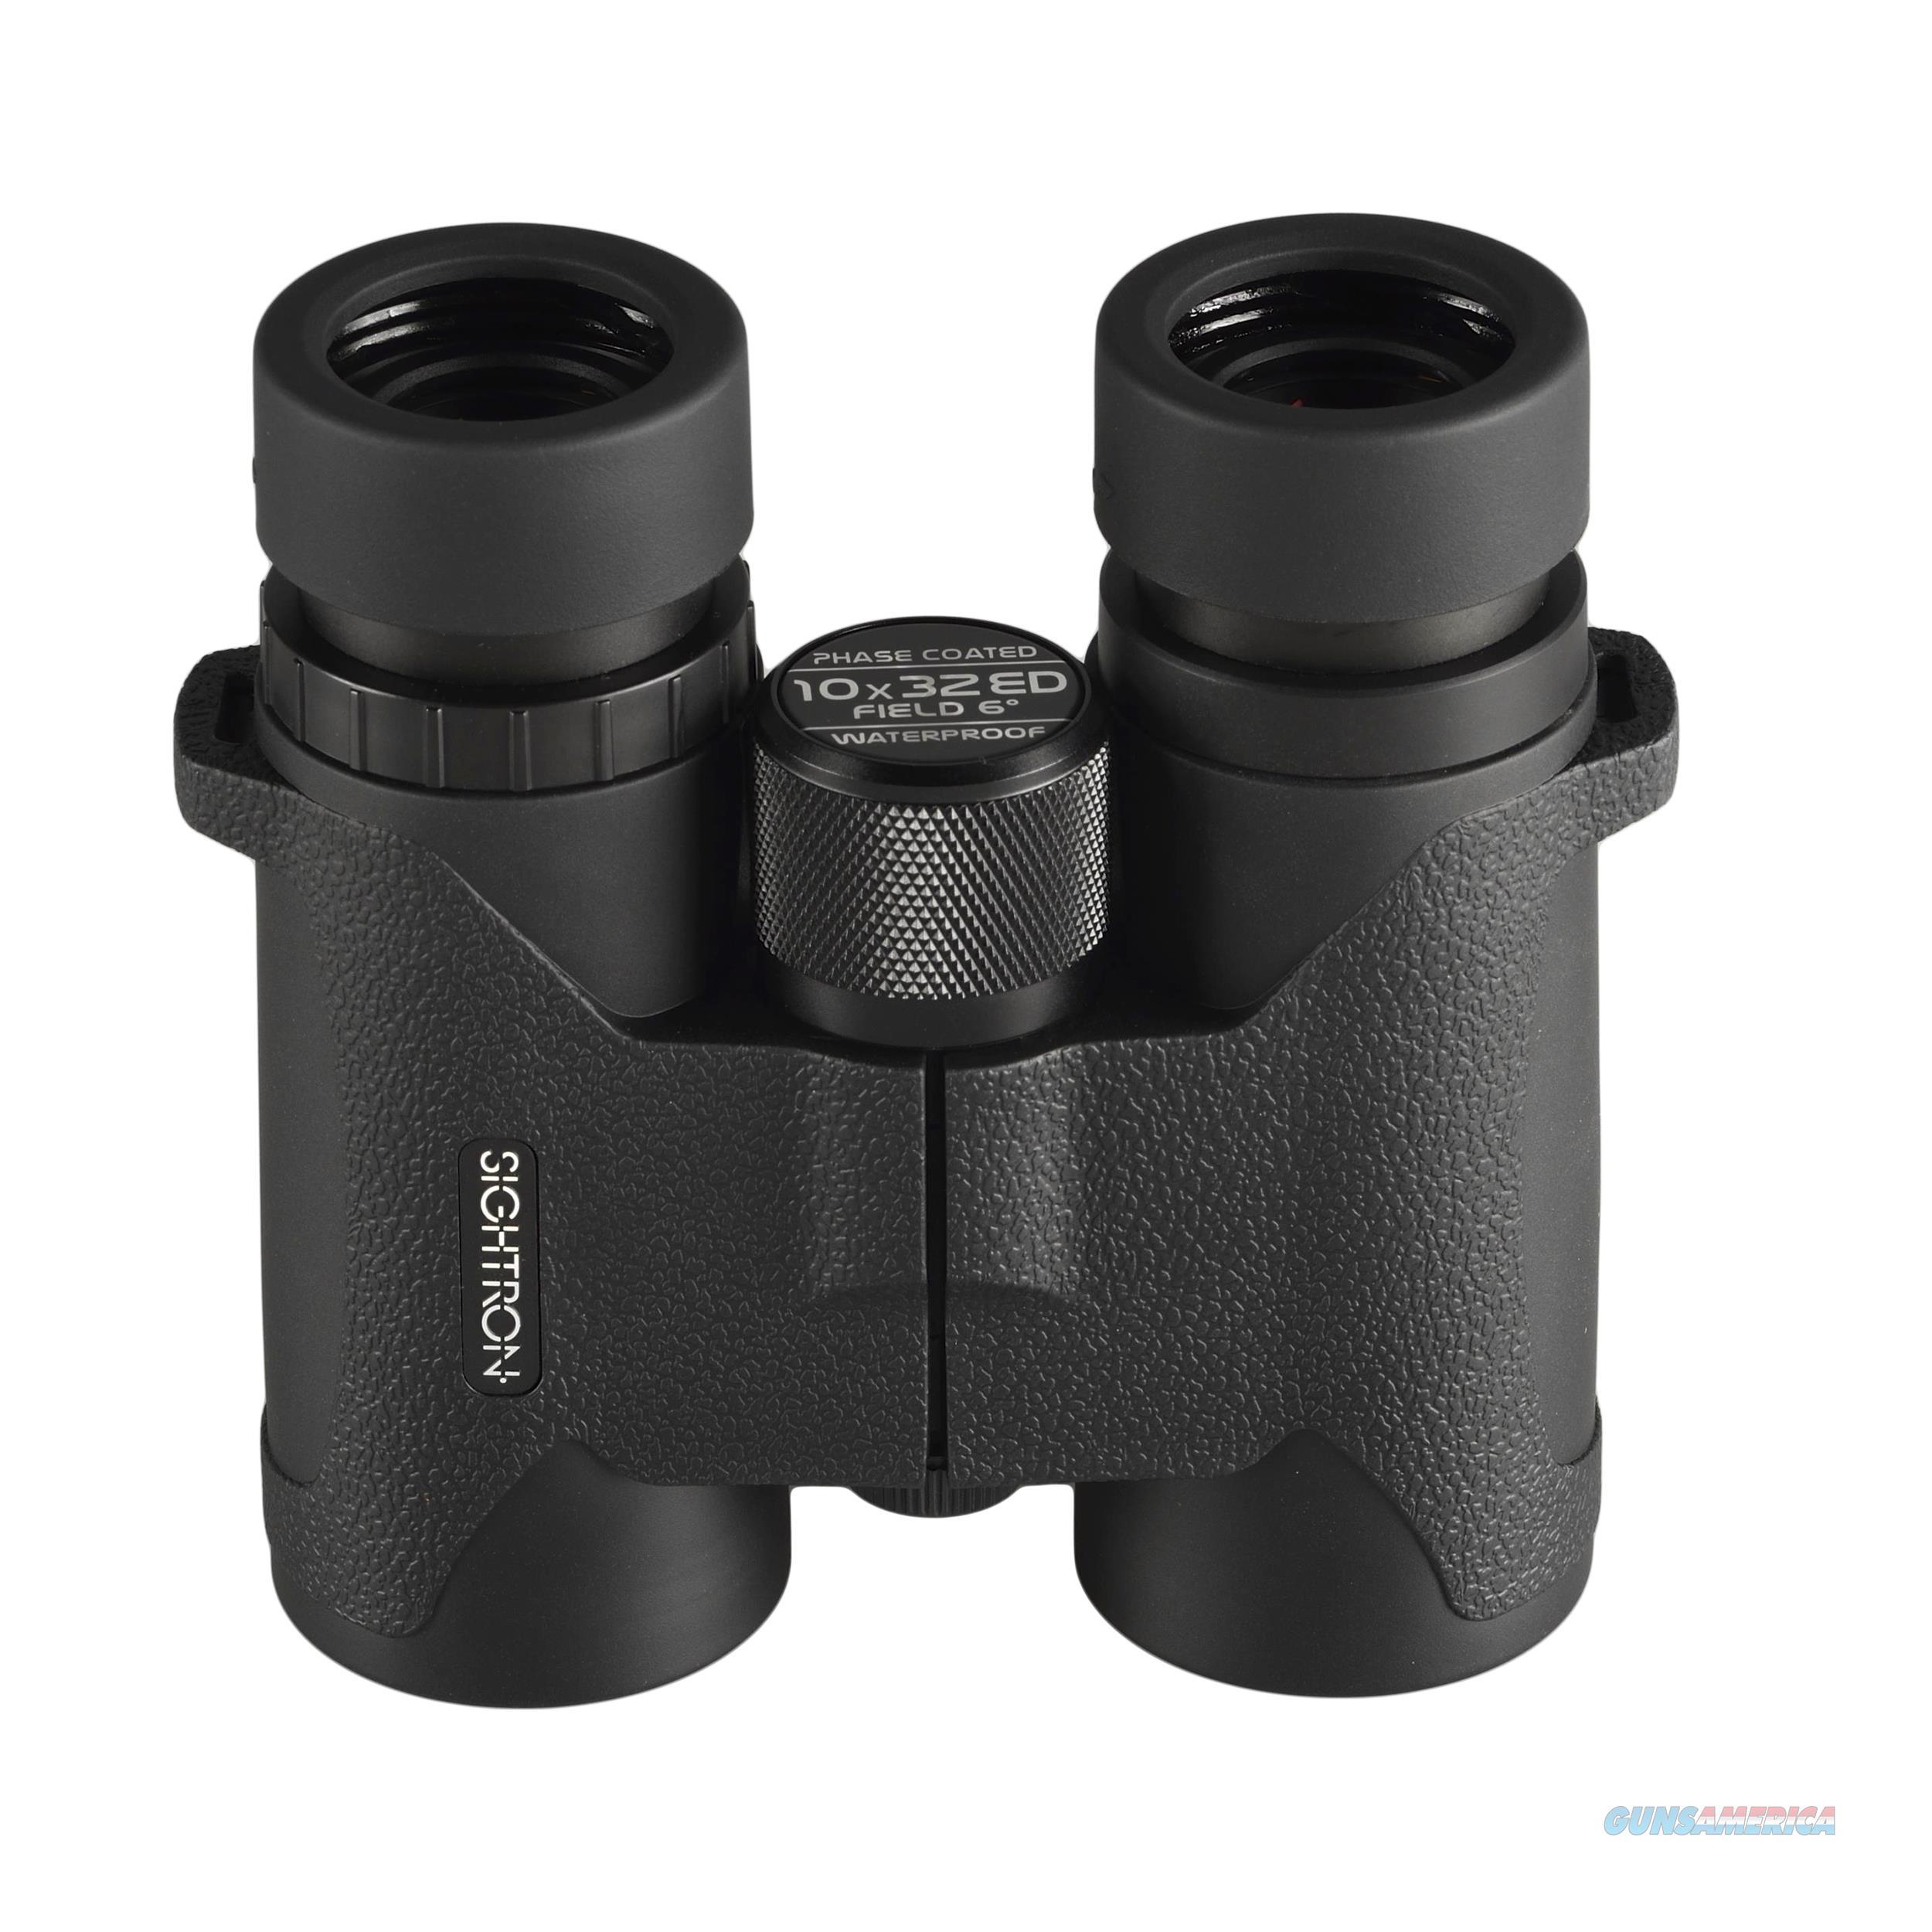 Sightron, Inc. Siii Series Binoculars 25164  Non-Guns > Scopes/Mounts/Rings & Optics > Non-Scope Optics > Binoculars